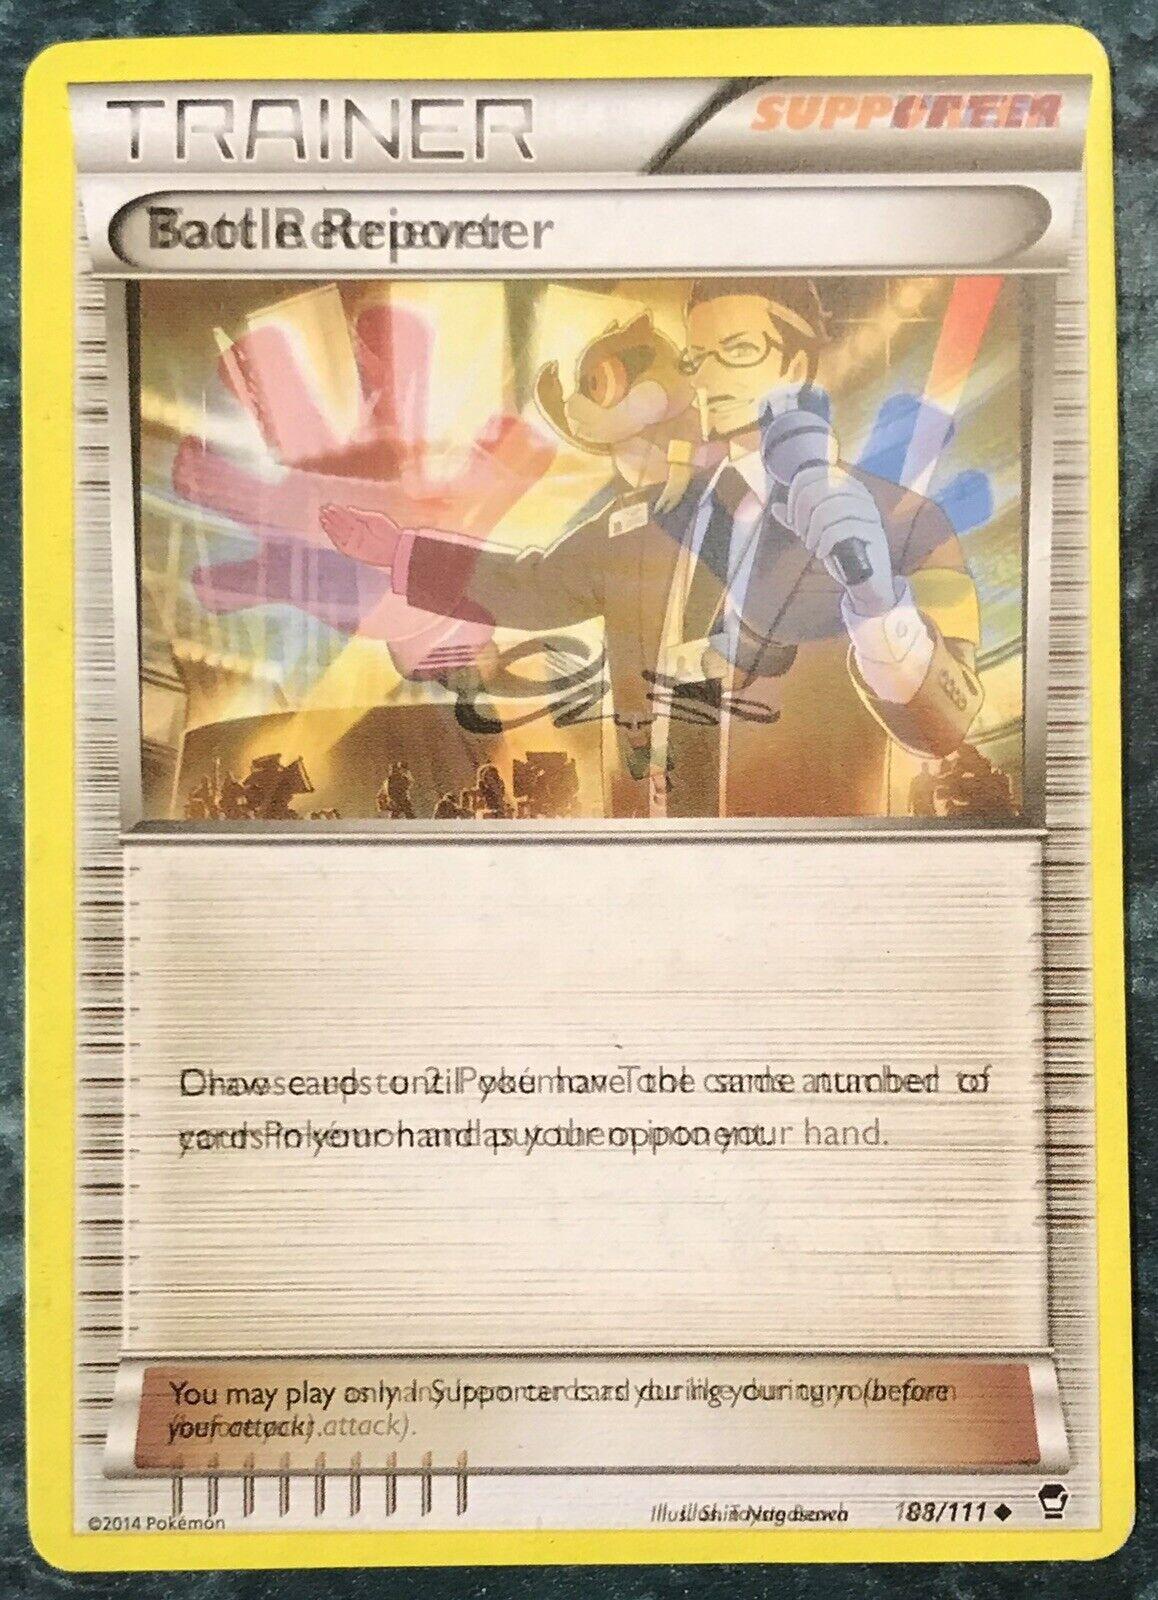 Super Sällsynt Misstryck Pokemon, slåss Annuncer Tool Retriever 101  111 88  111